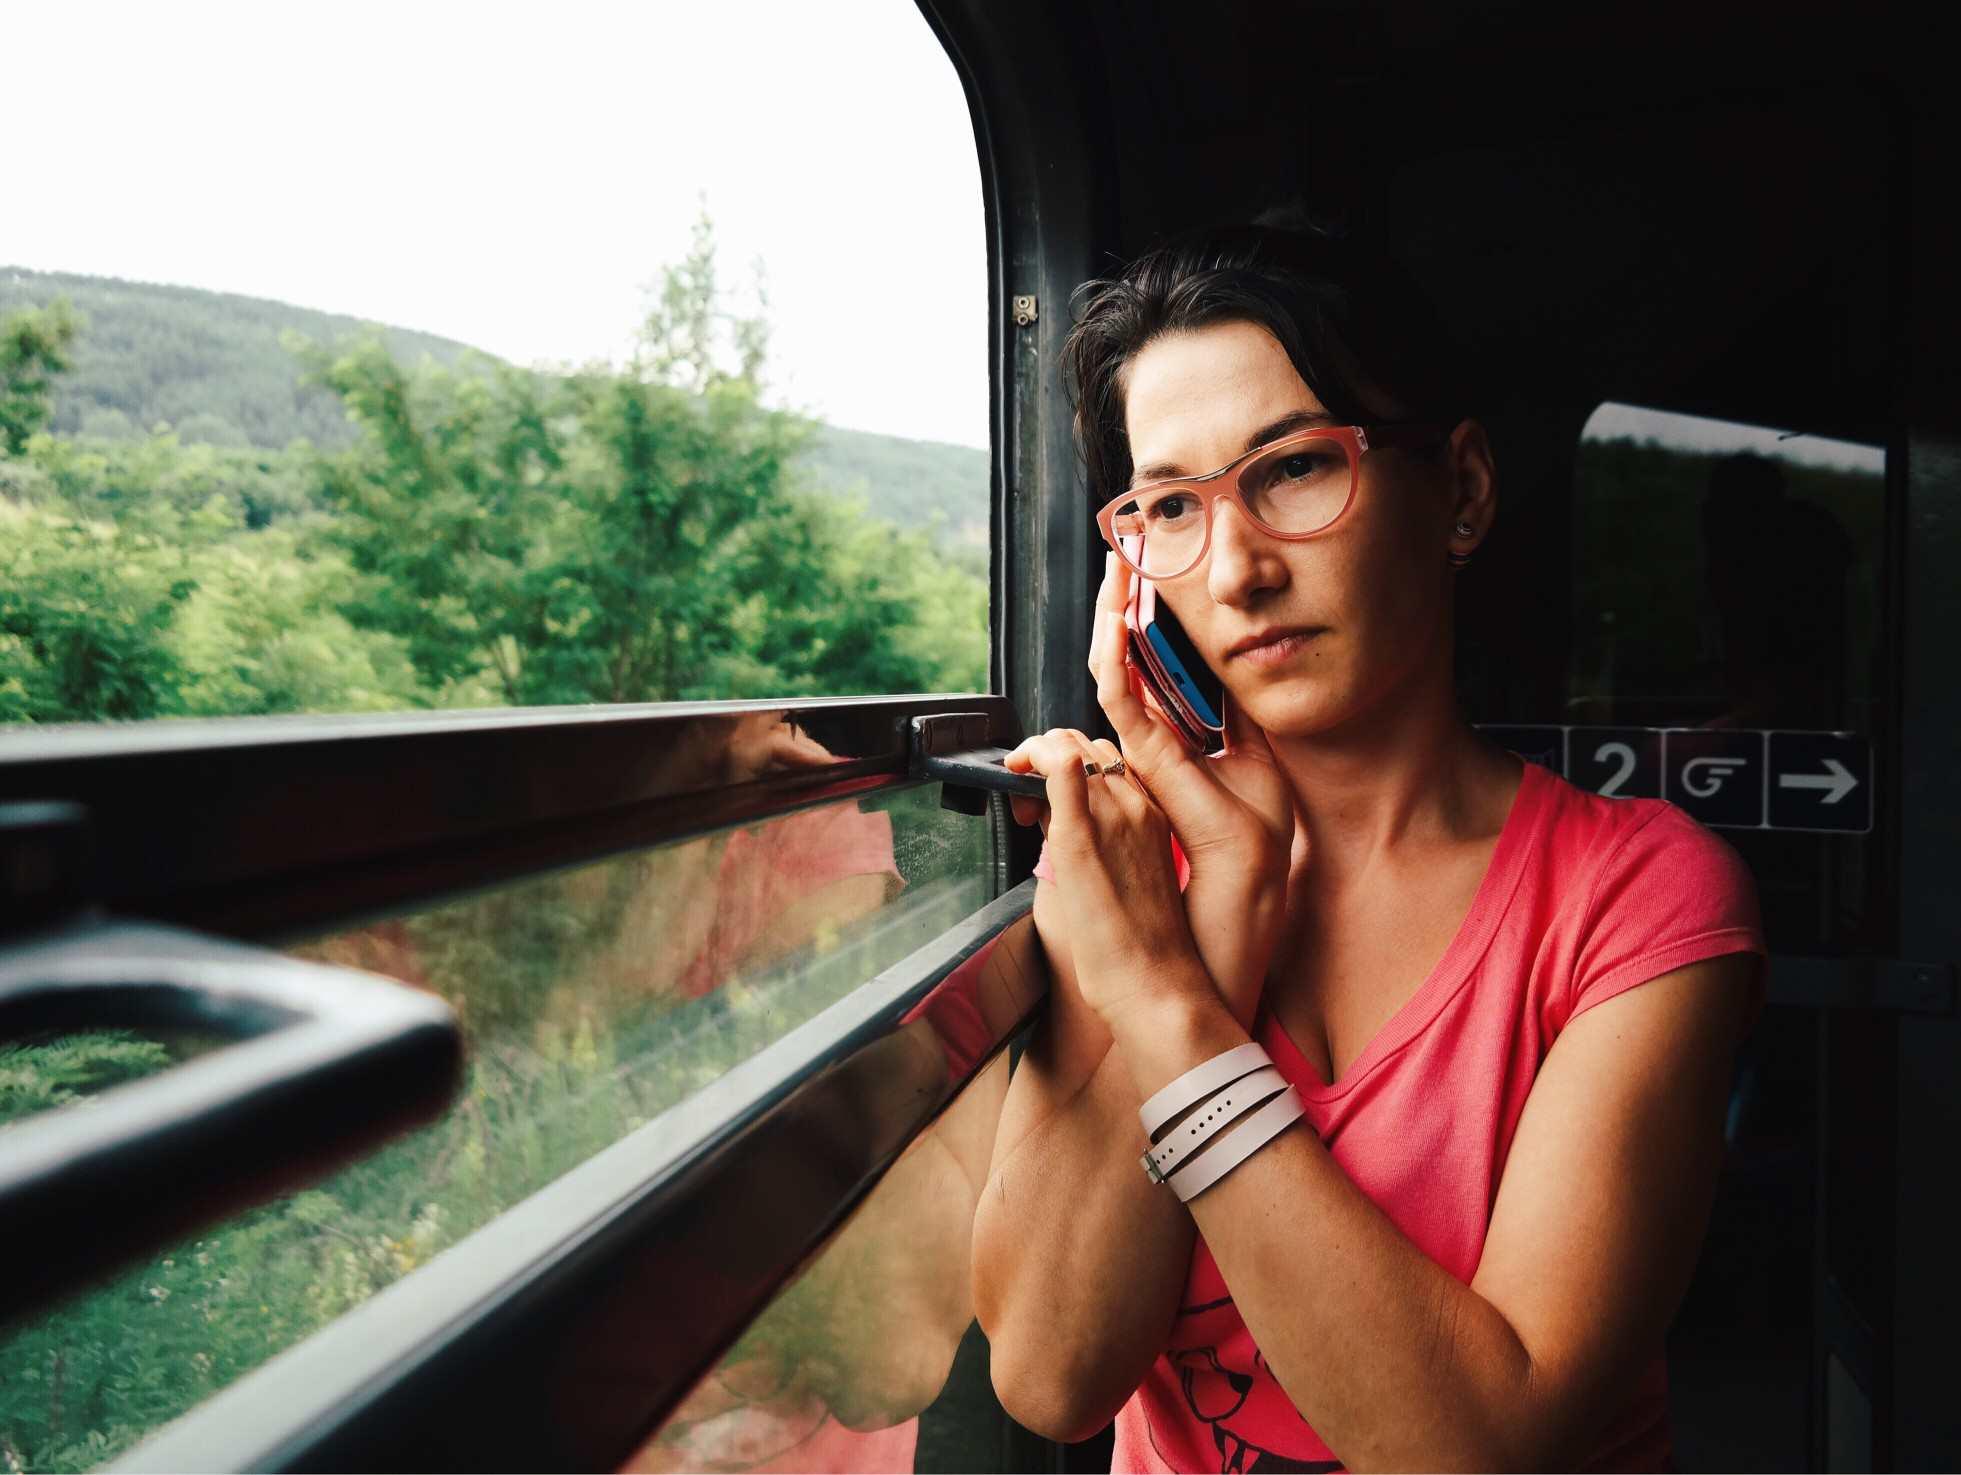 Woman having stressful conversation on phone